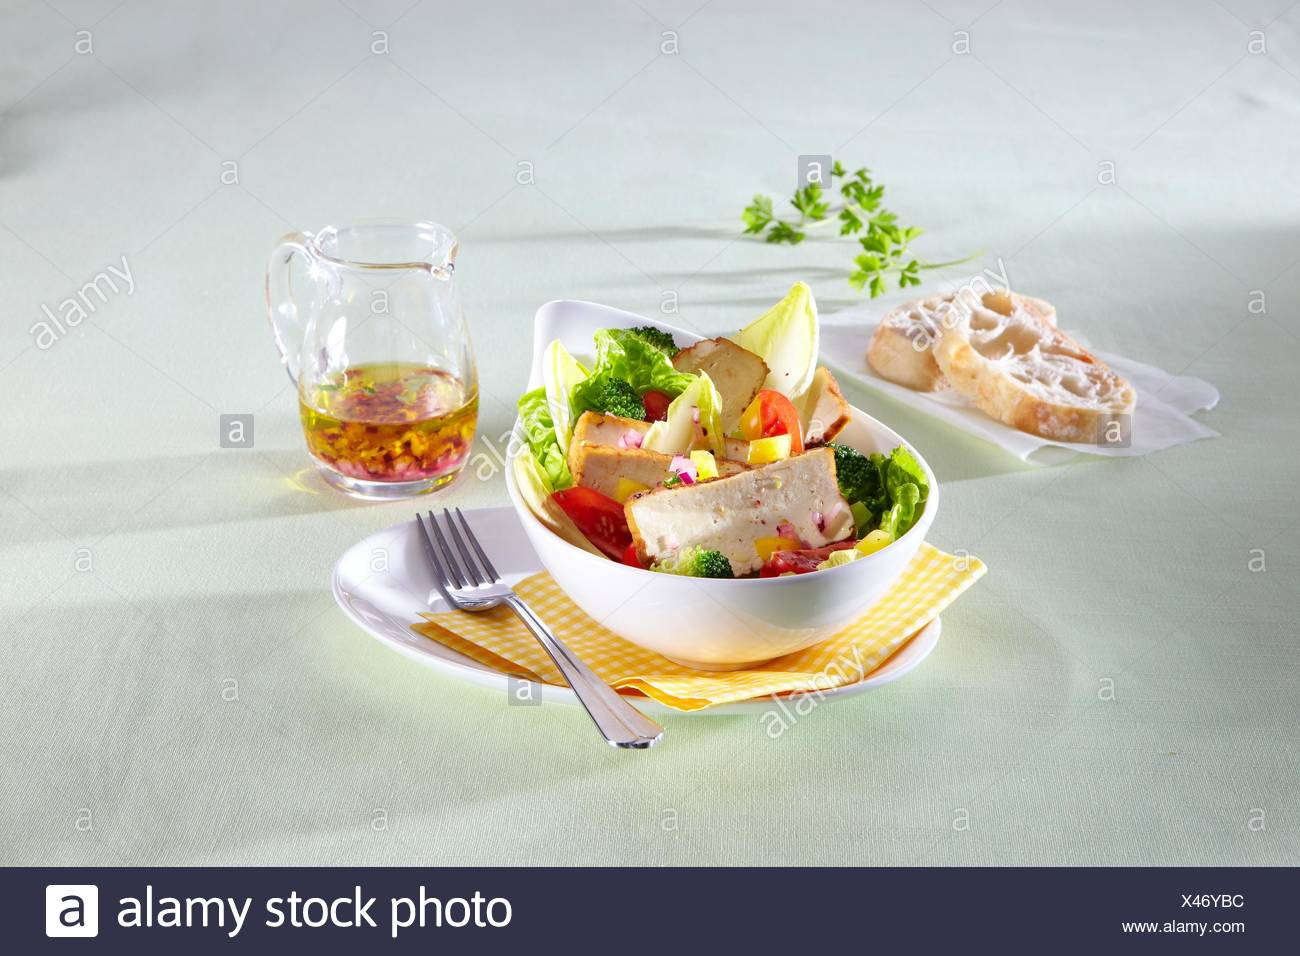 Salad with smoked tofu - Stock Image